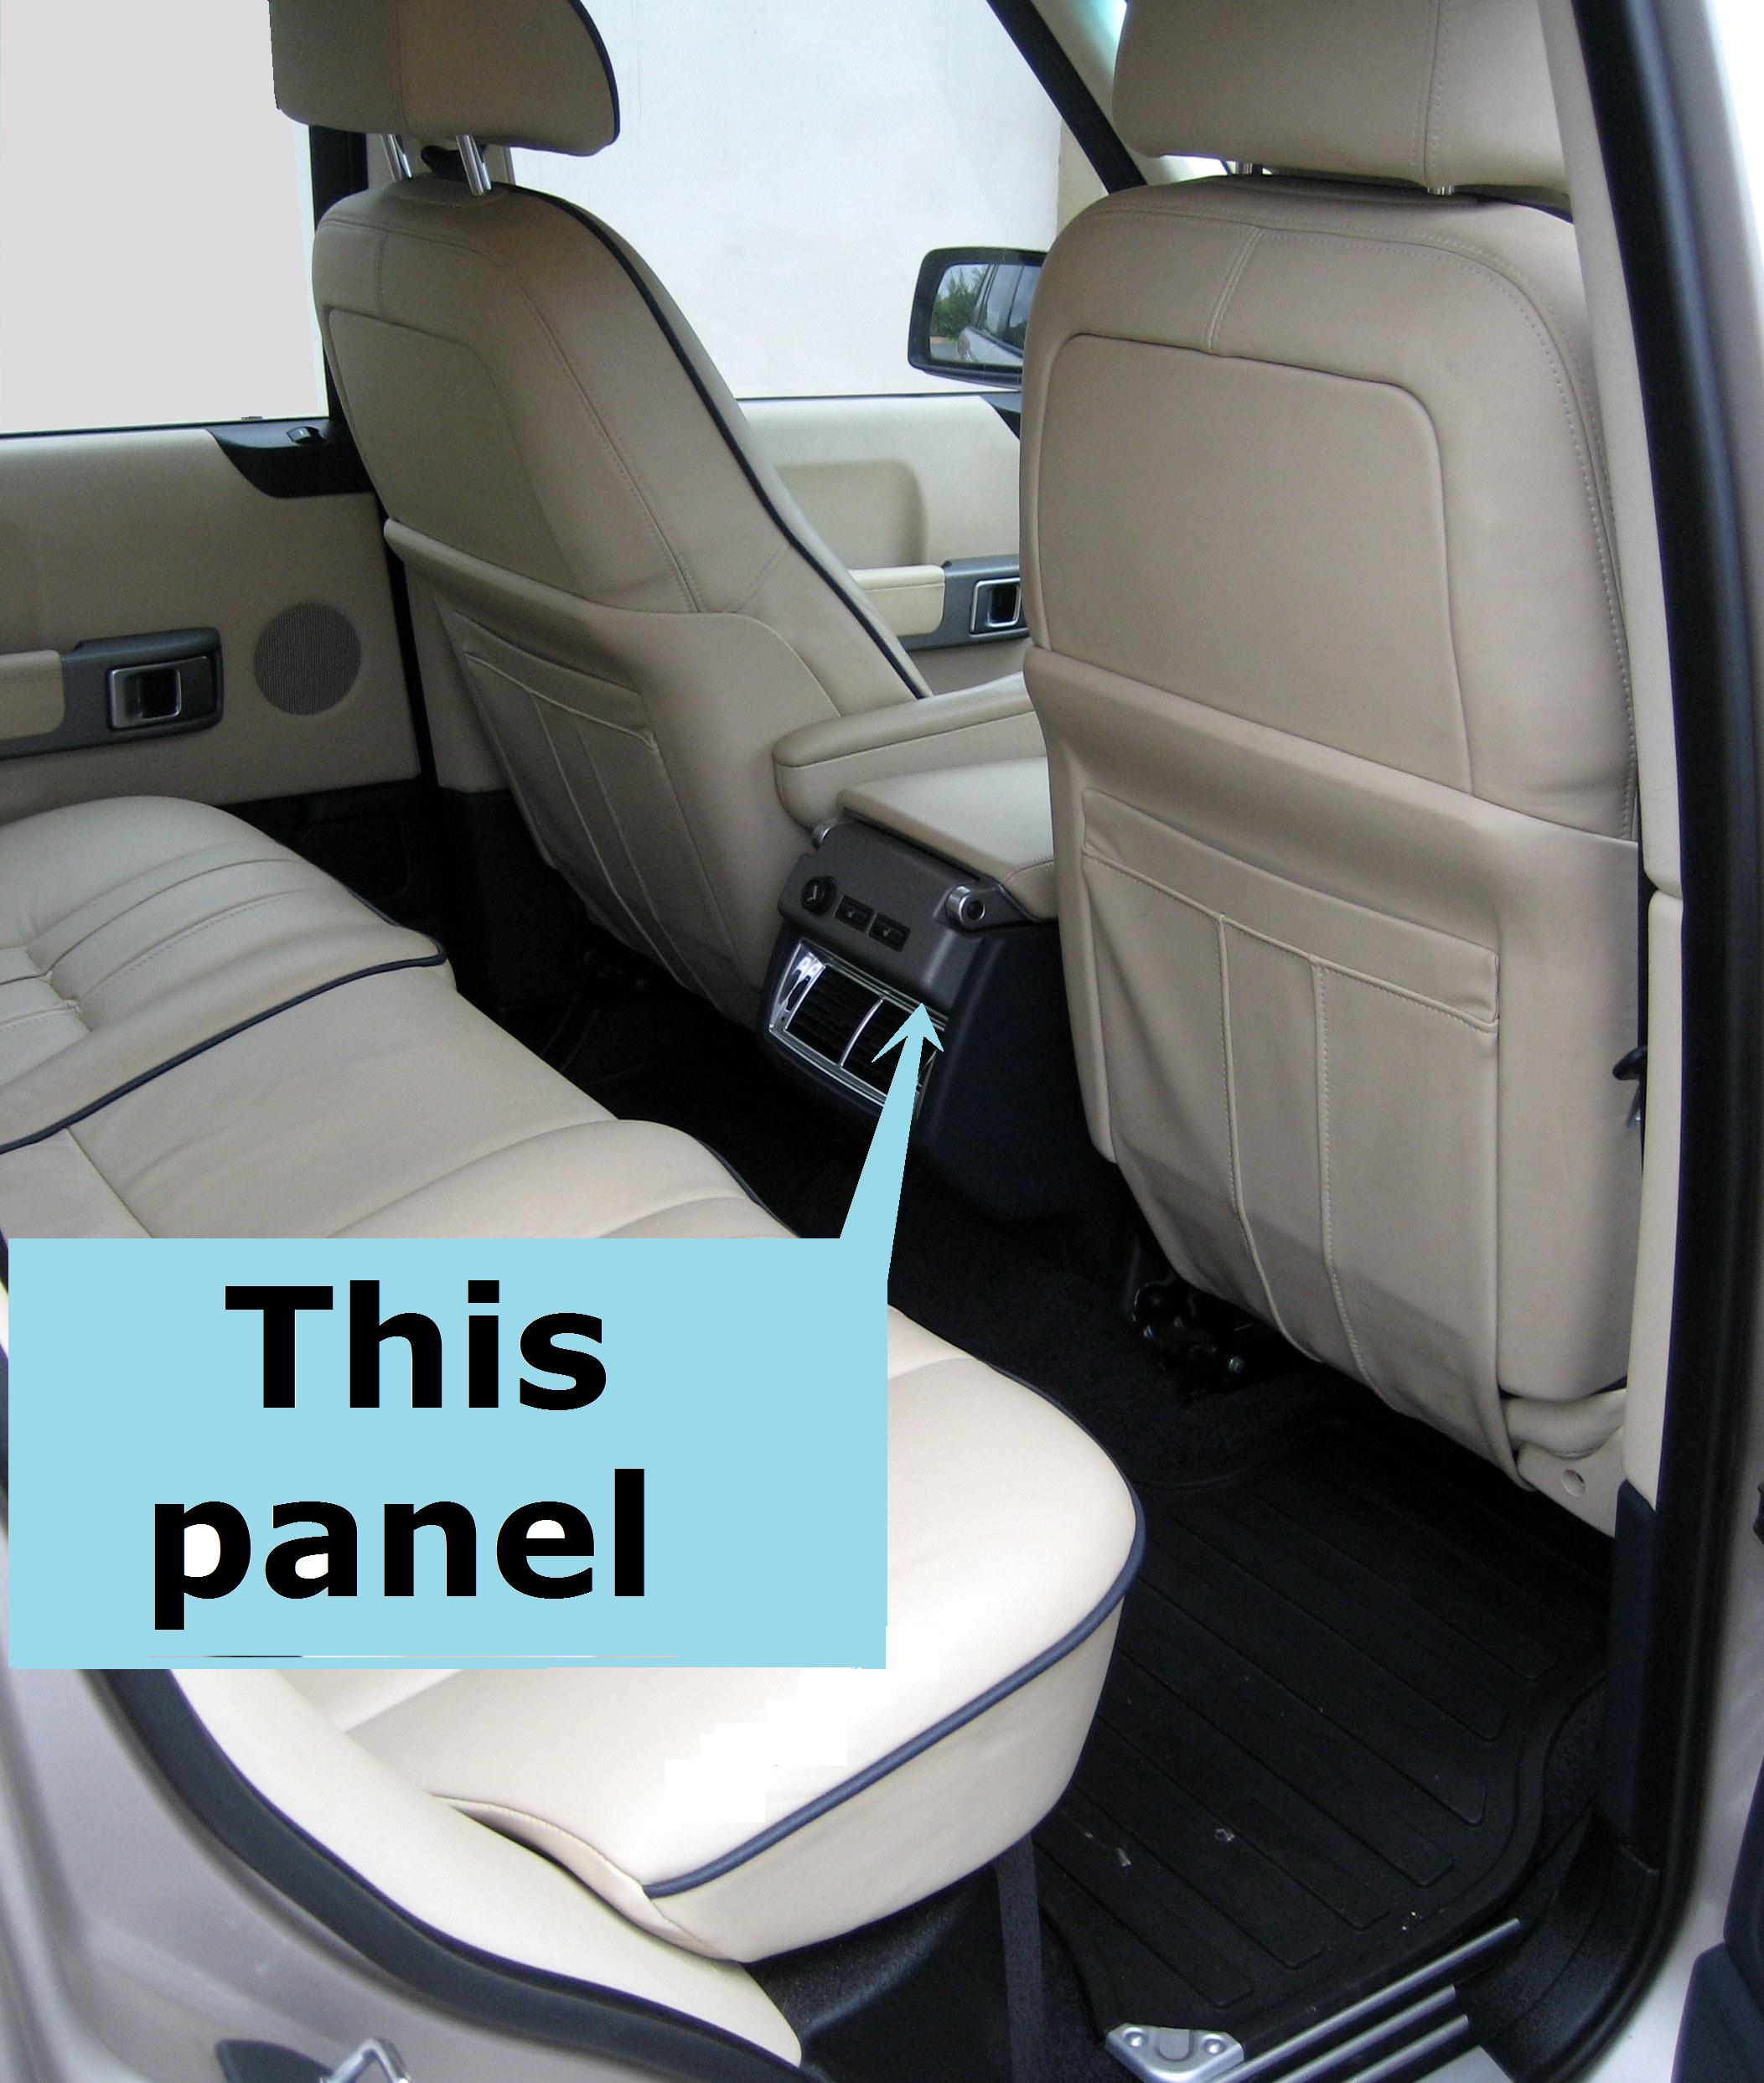 2002 Land Rover Range Rover Interior: Rear Passenger Control Fascia For Range Rover L322